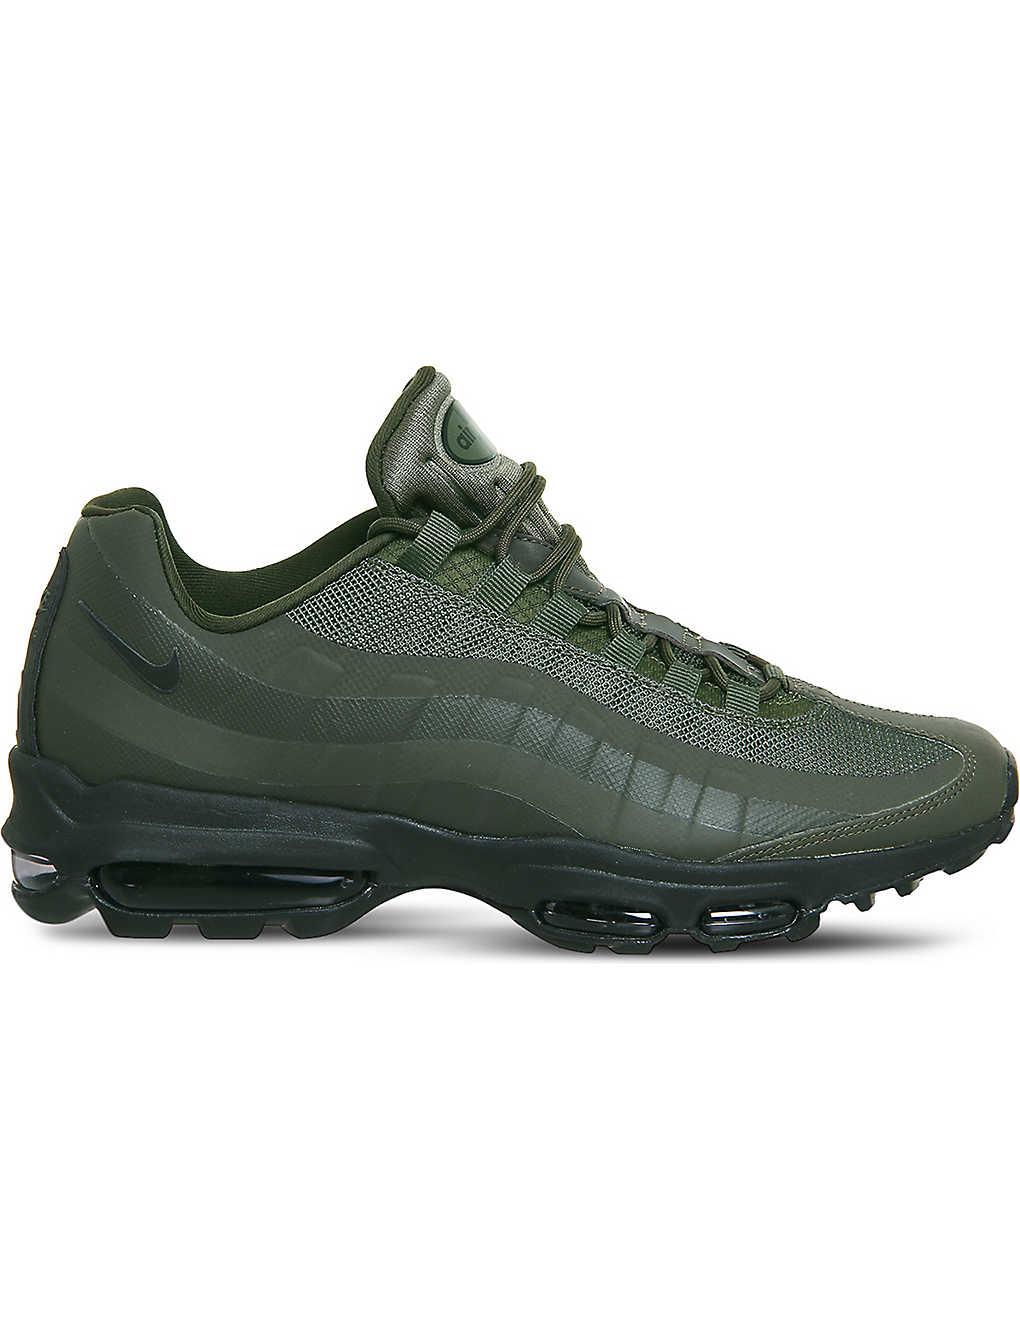 3b3790290a4c6 NIKE - Air Max 95 Ultra leather and mesh trainers | Selfridges.com